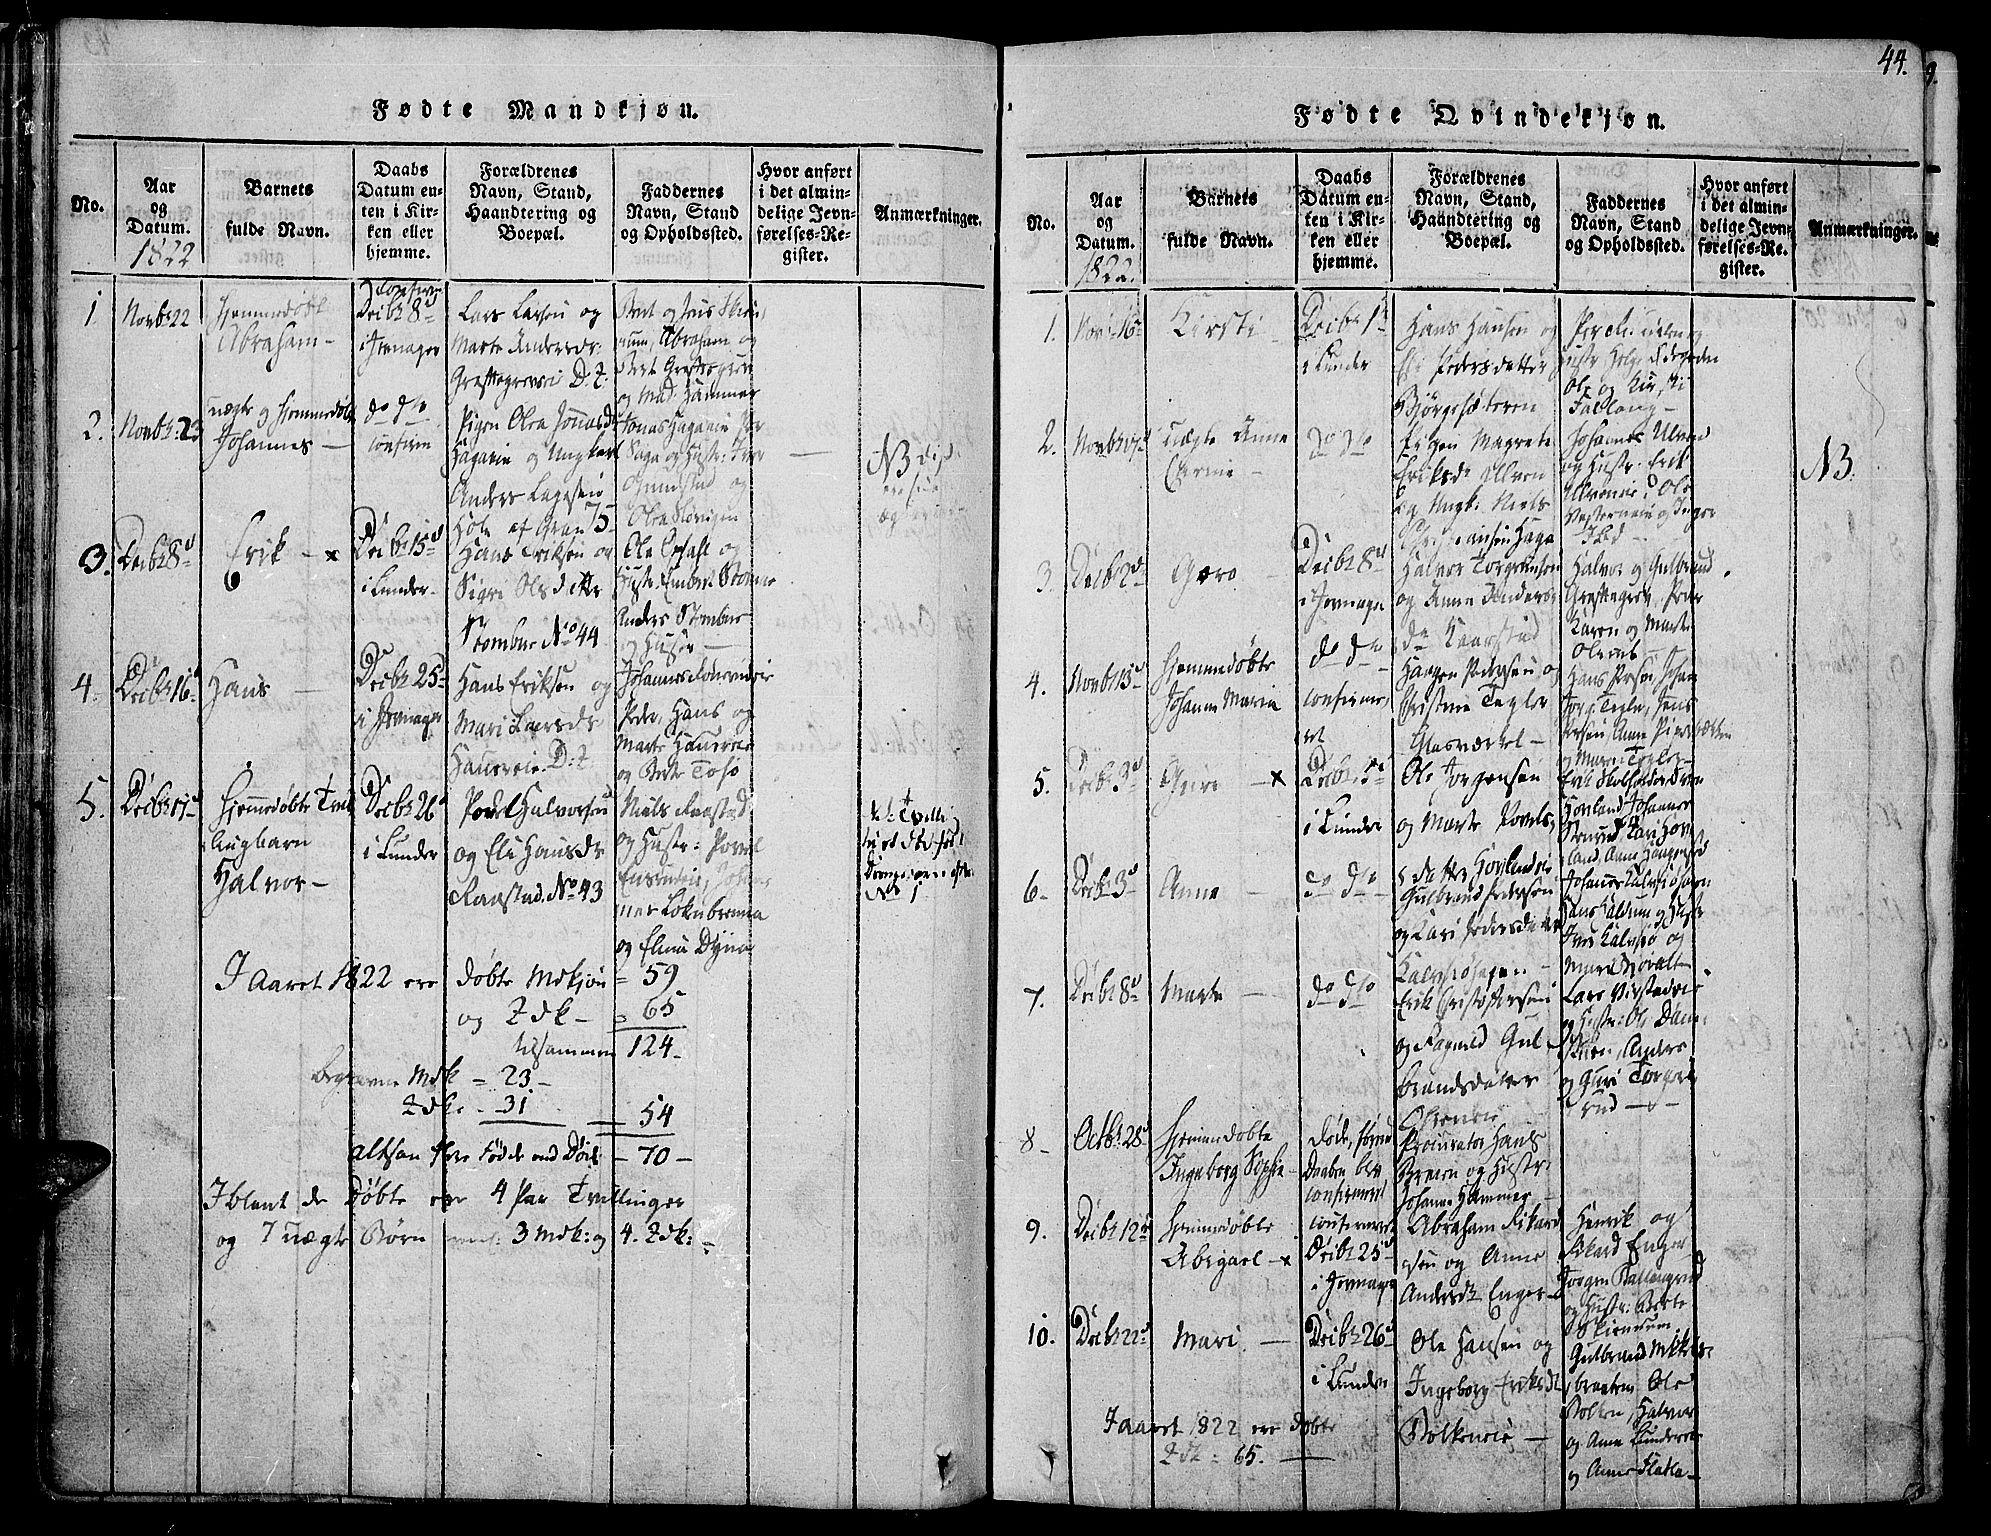 SAH, Jevnaker prestekontor, Ministerialbok nr. 5, 1815-1837, s. 44